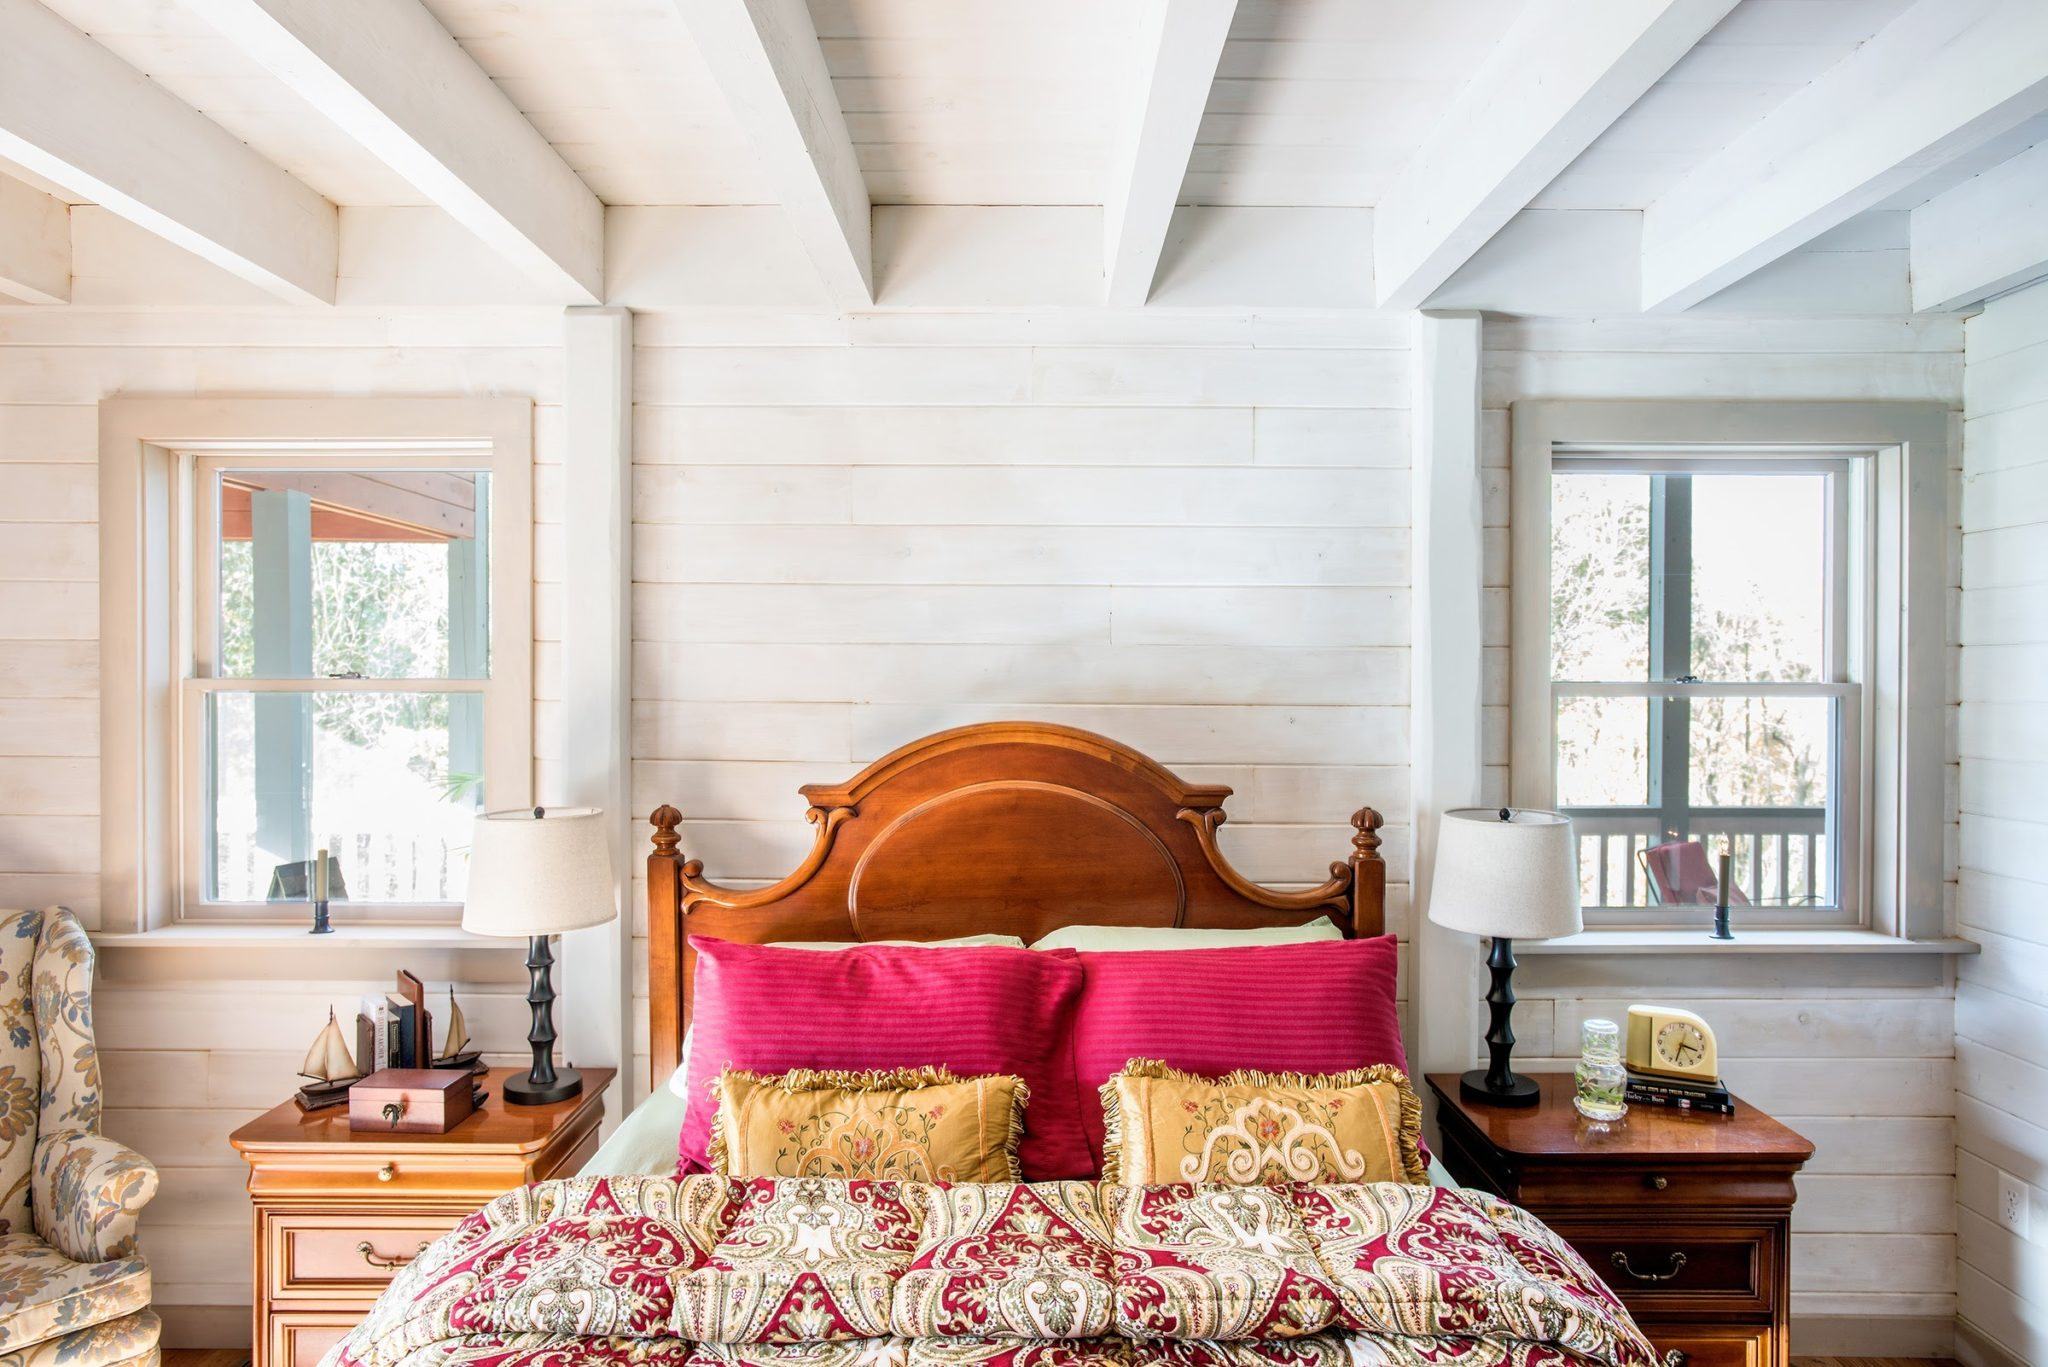 Fullsize Of Farmhouse Style Homes Interior